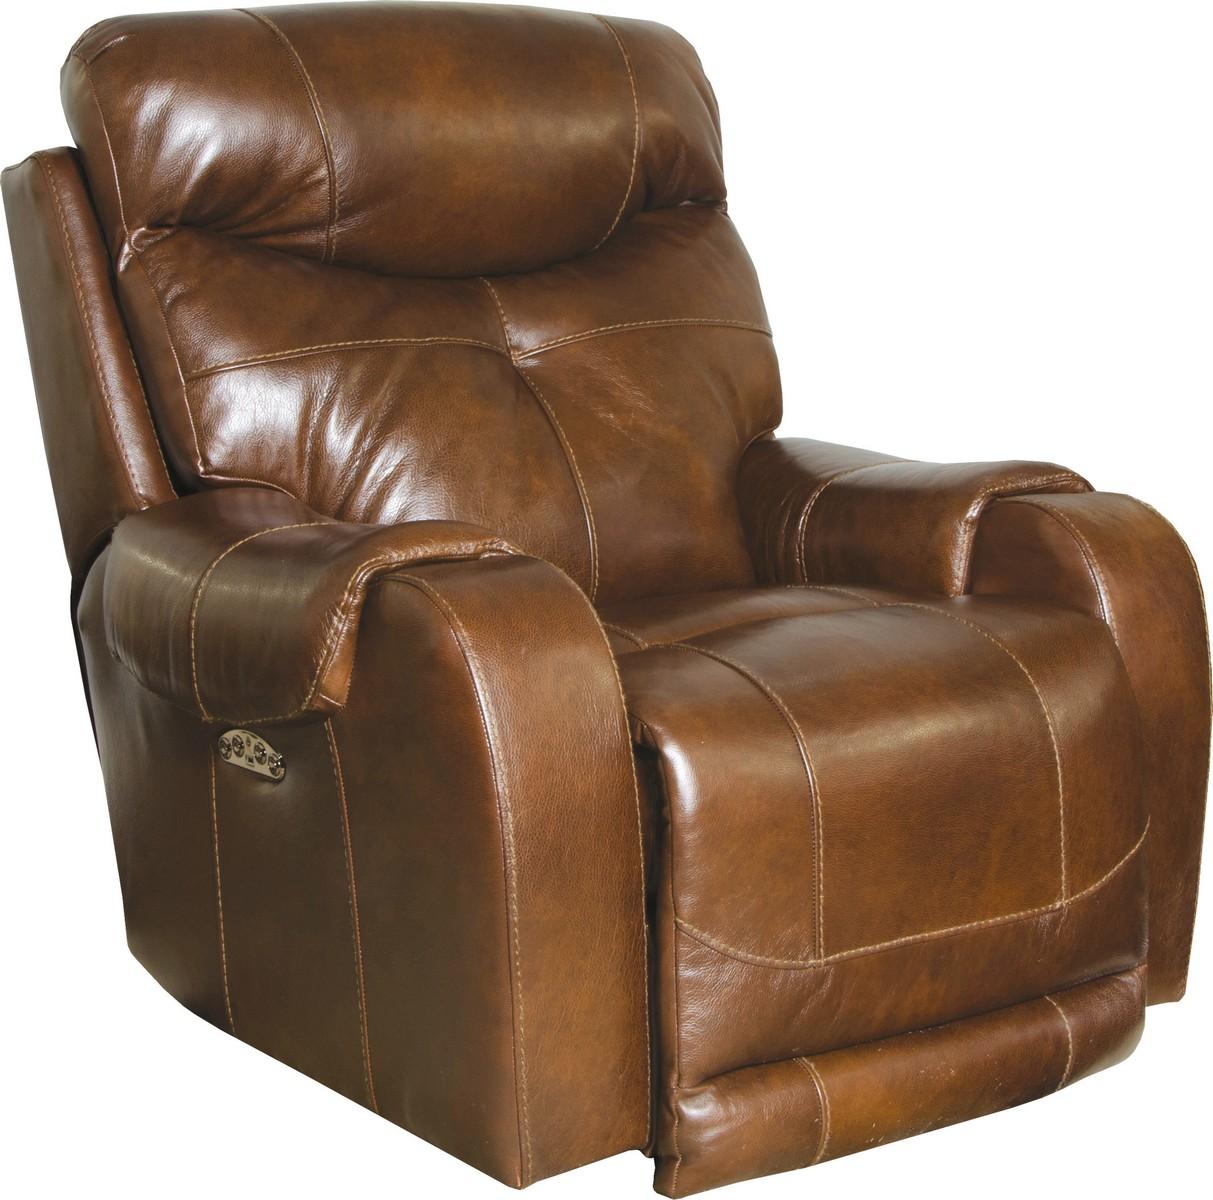 lay flat recliner chairs office chair mats carpet staples catnapper venice top grain leather touch power headrest